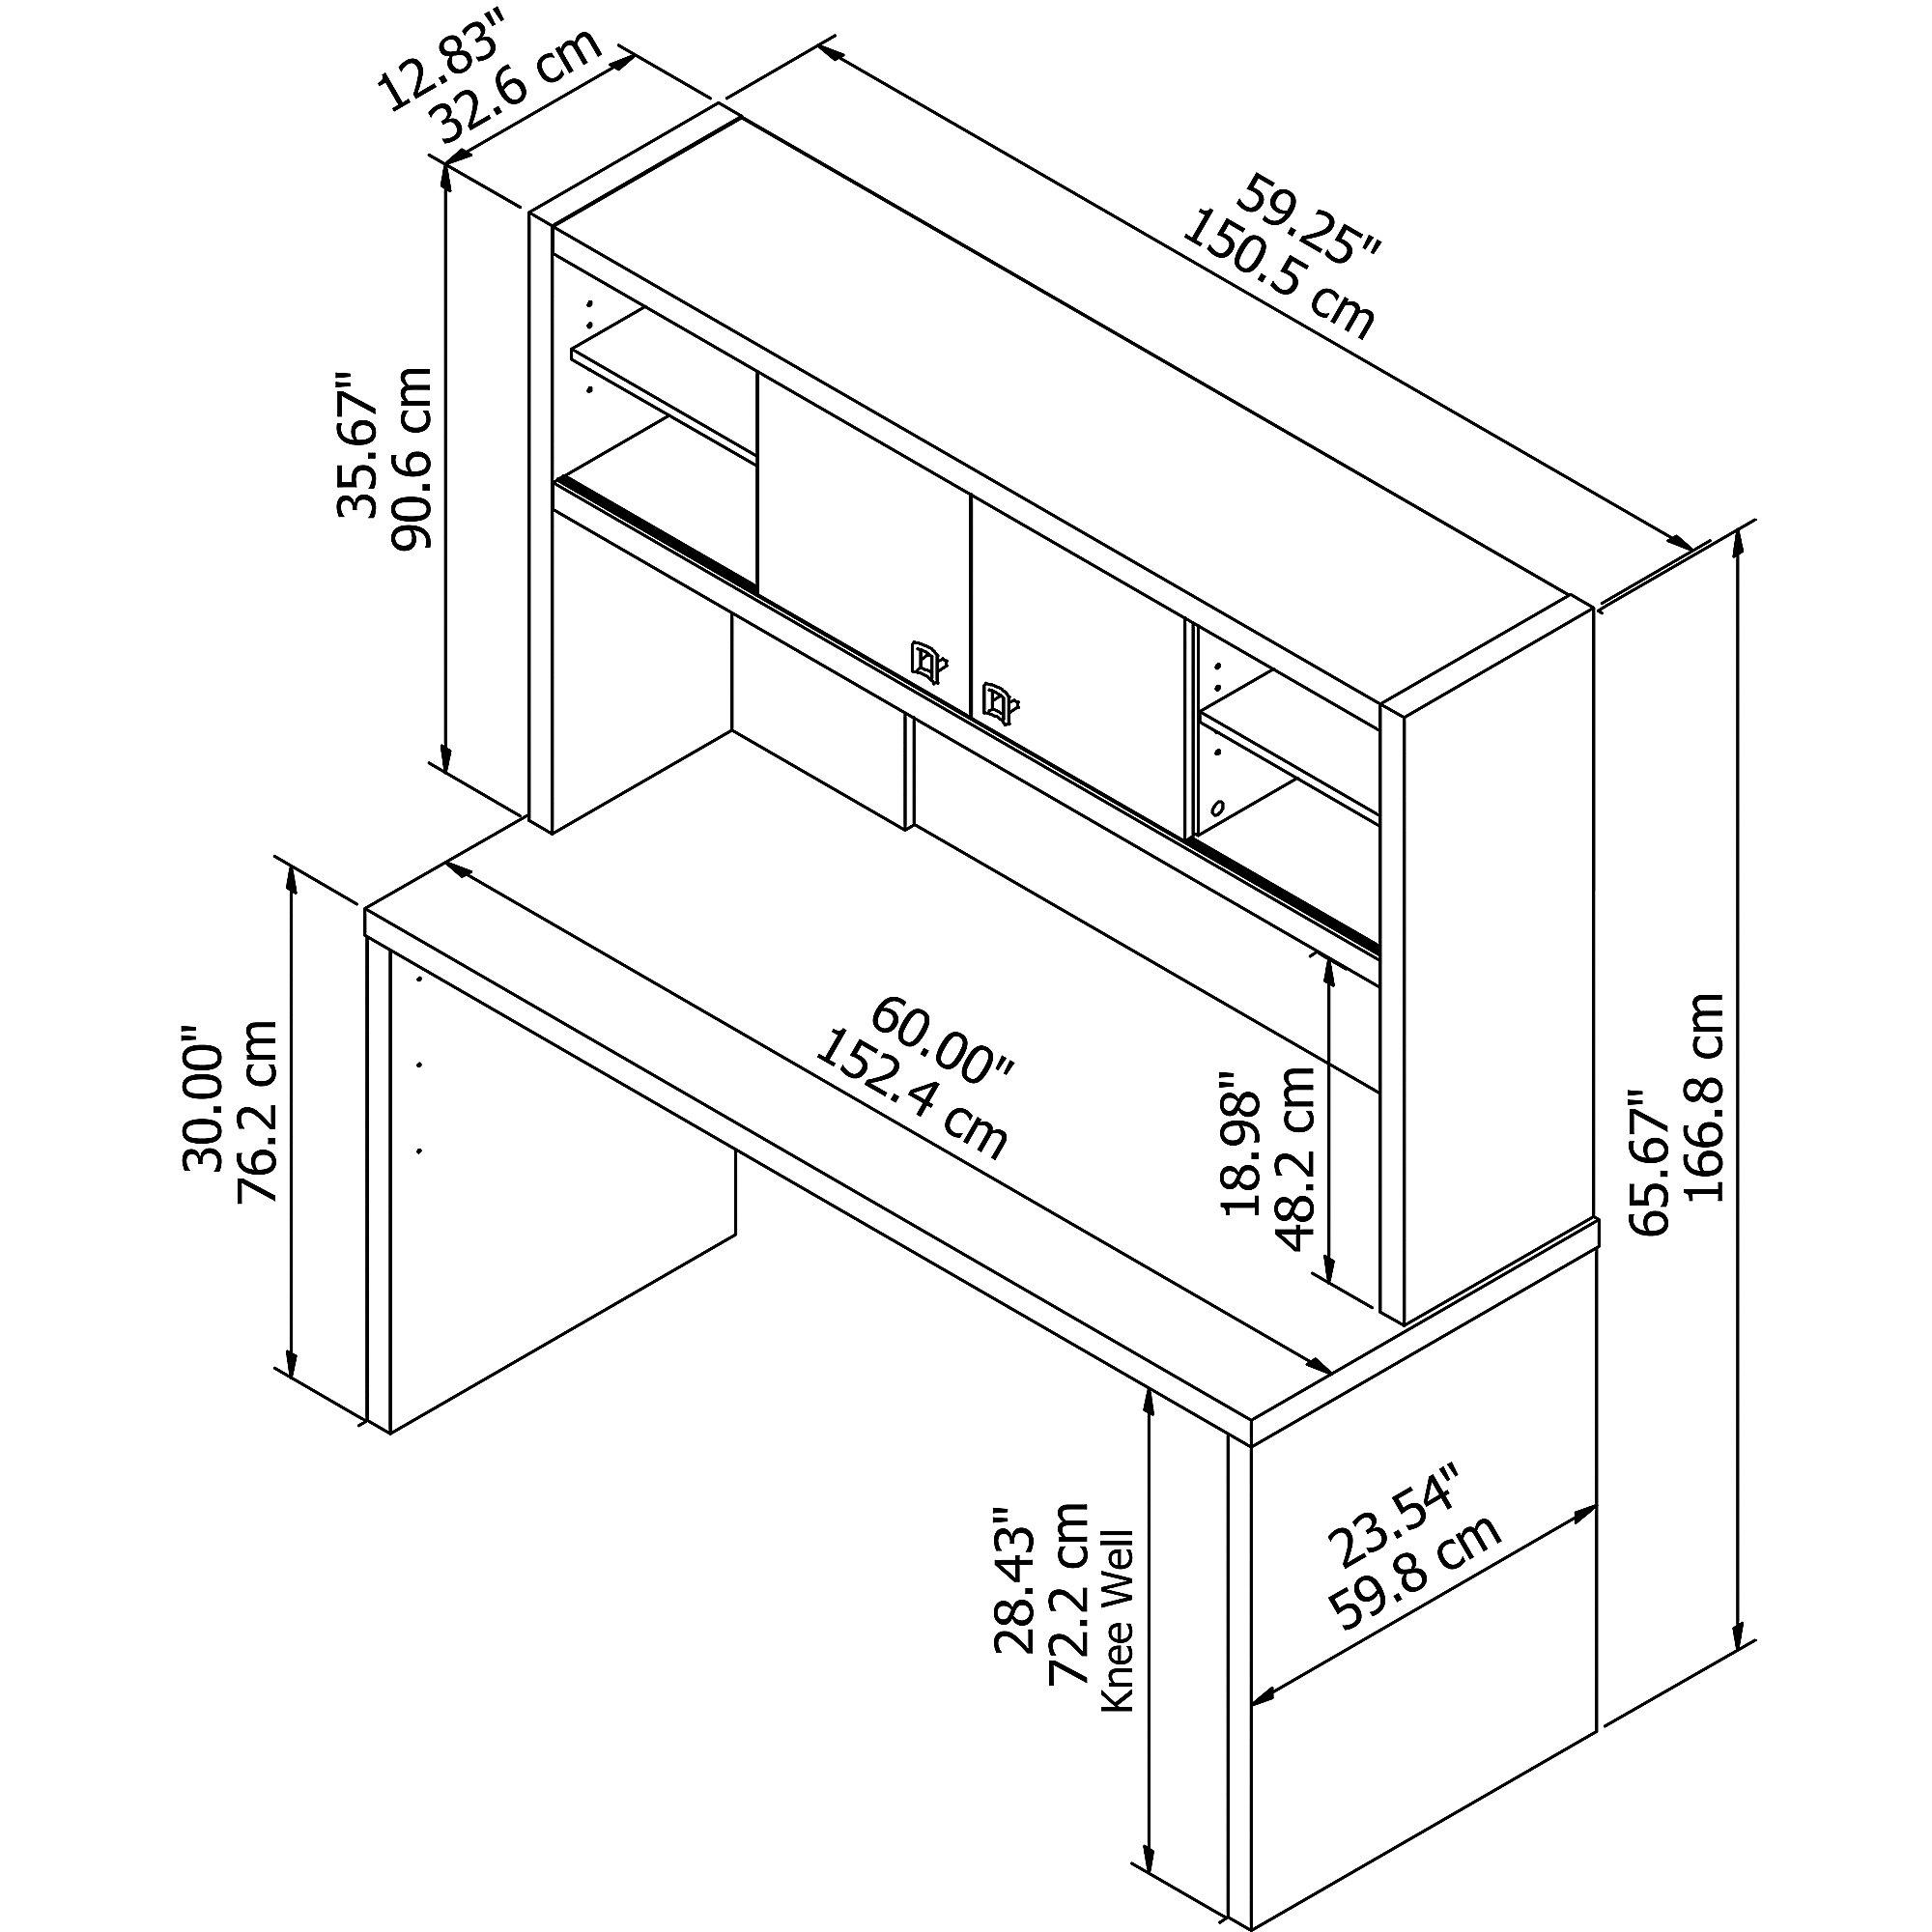 ech030 component dimensions